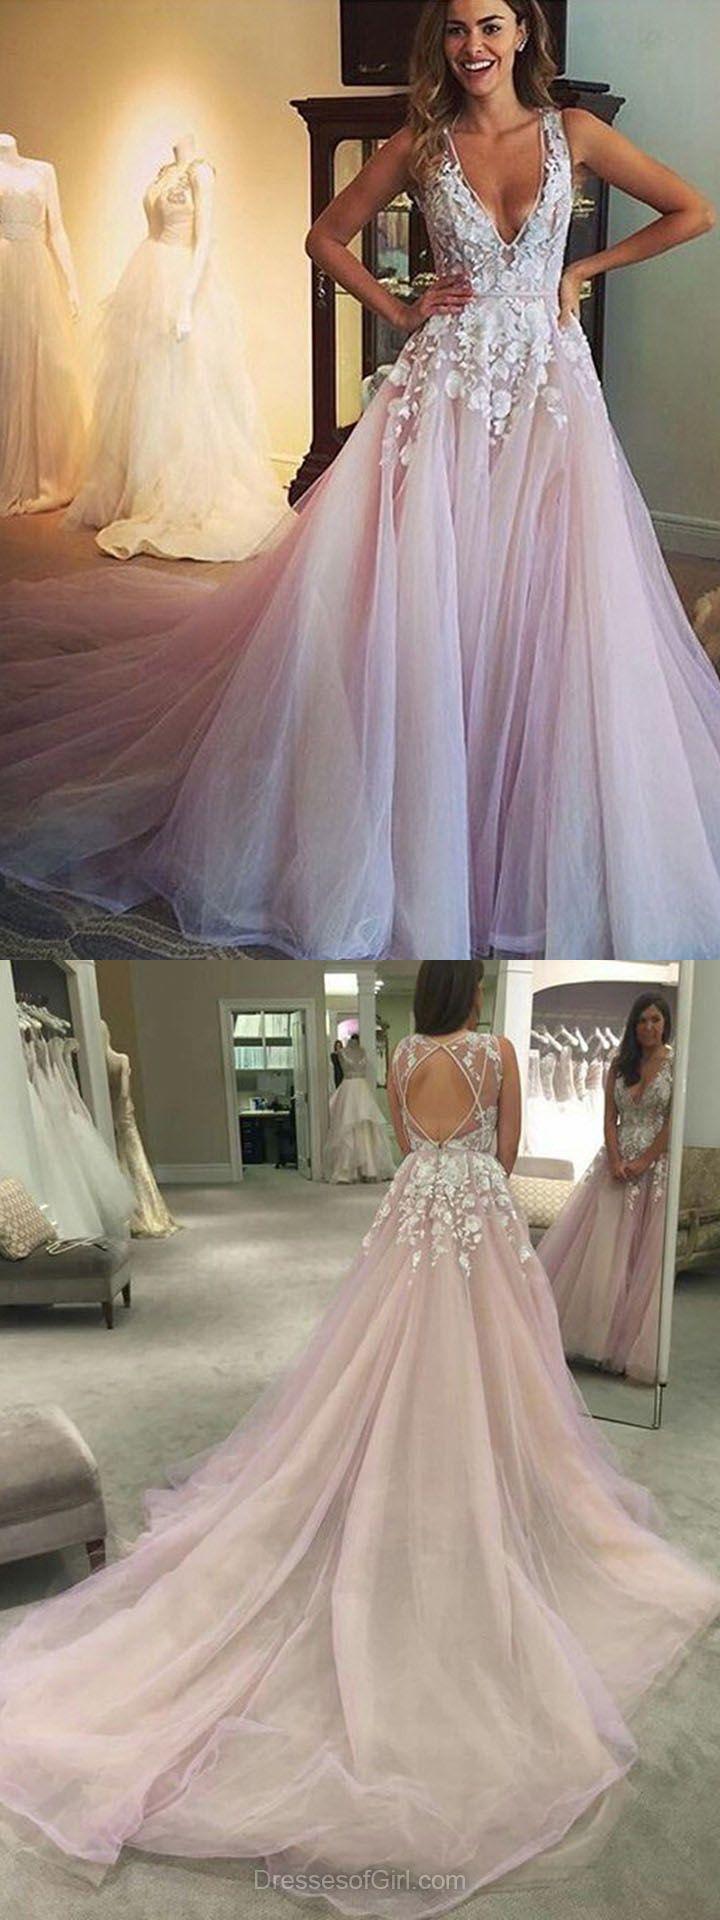 Amazing lace evening dresses